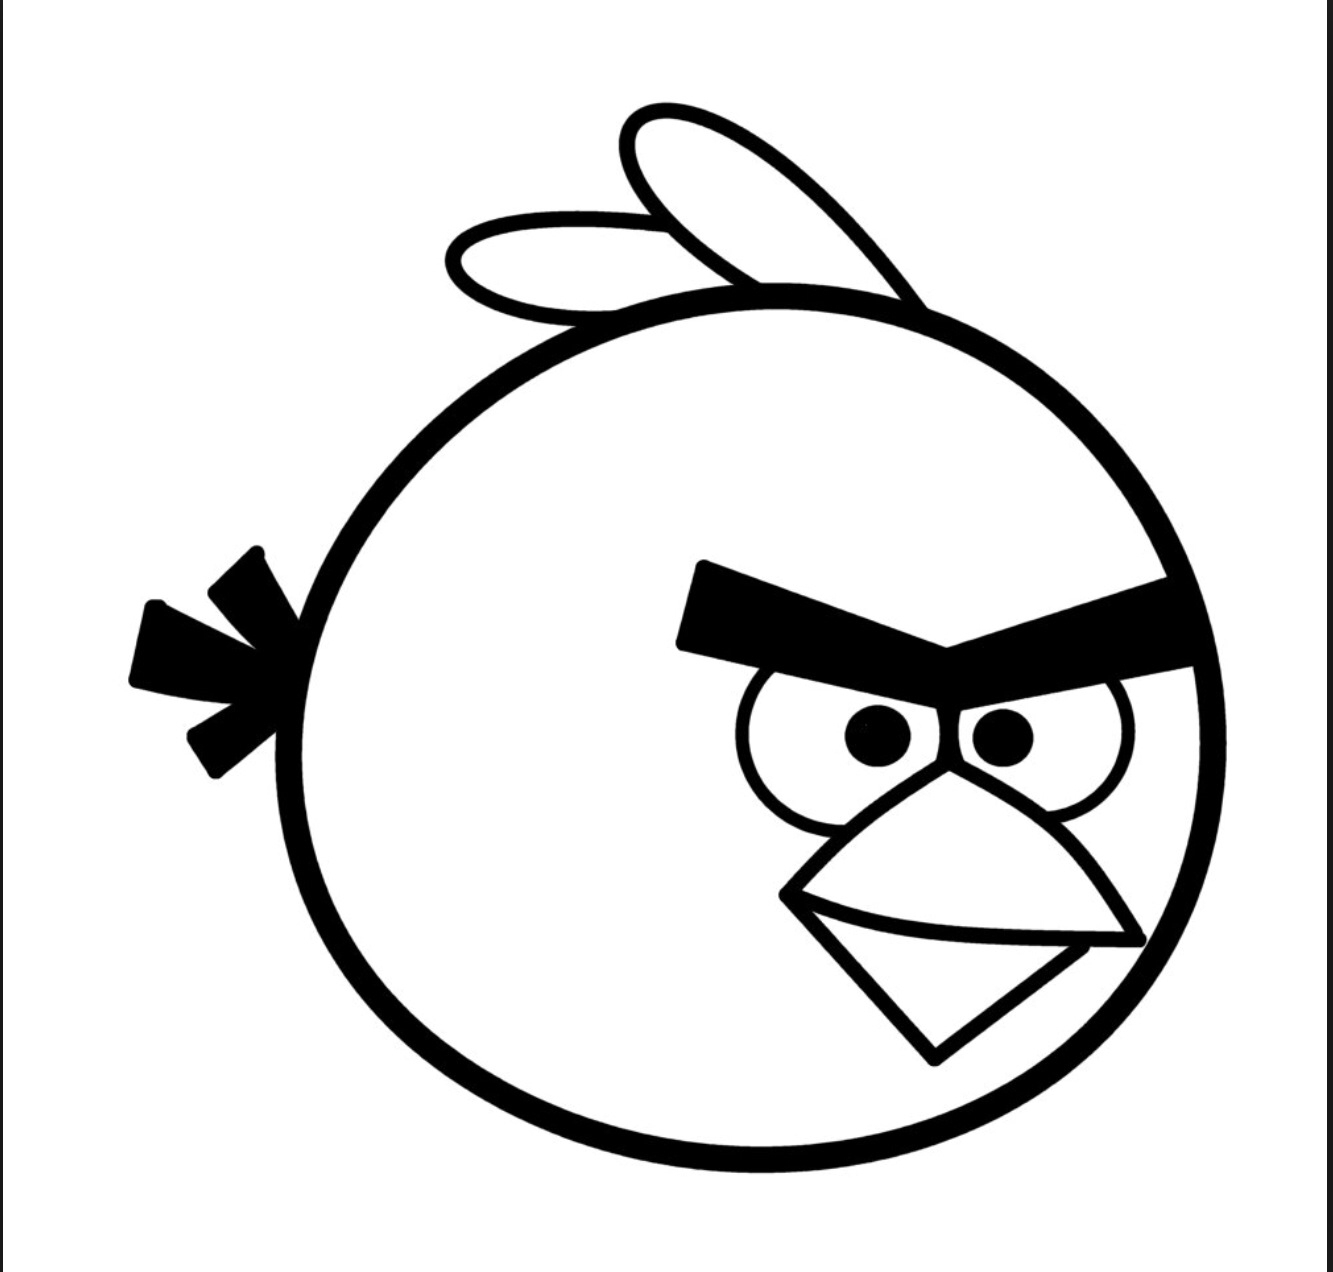 Bird Clipart Black And White